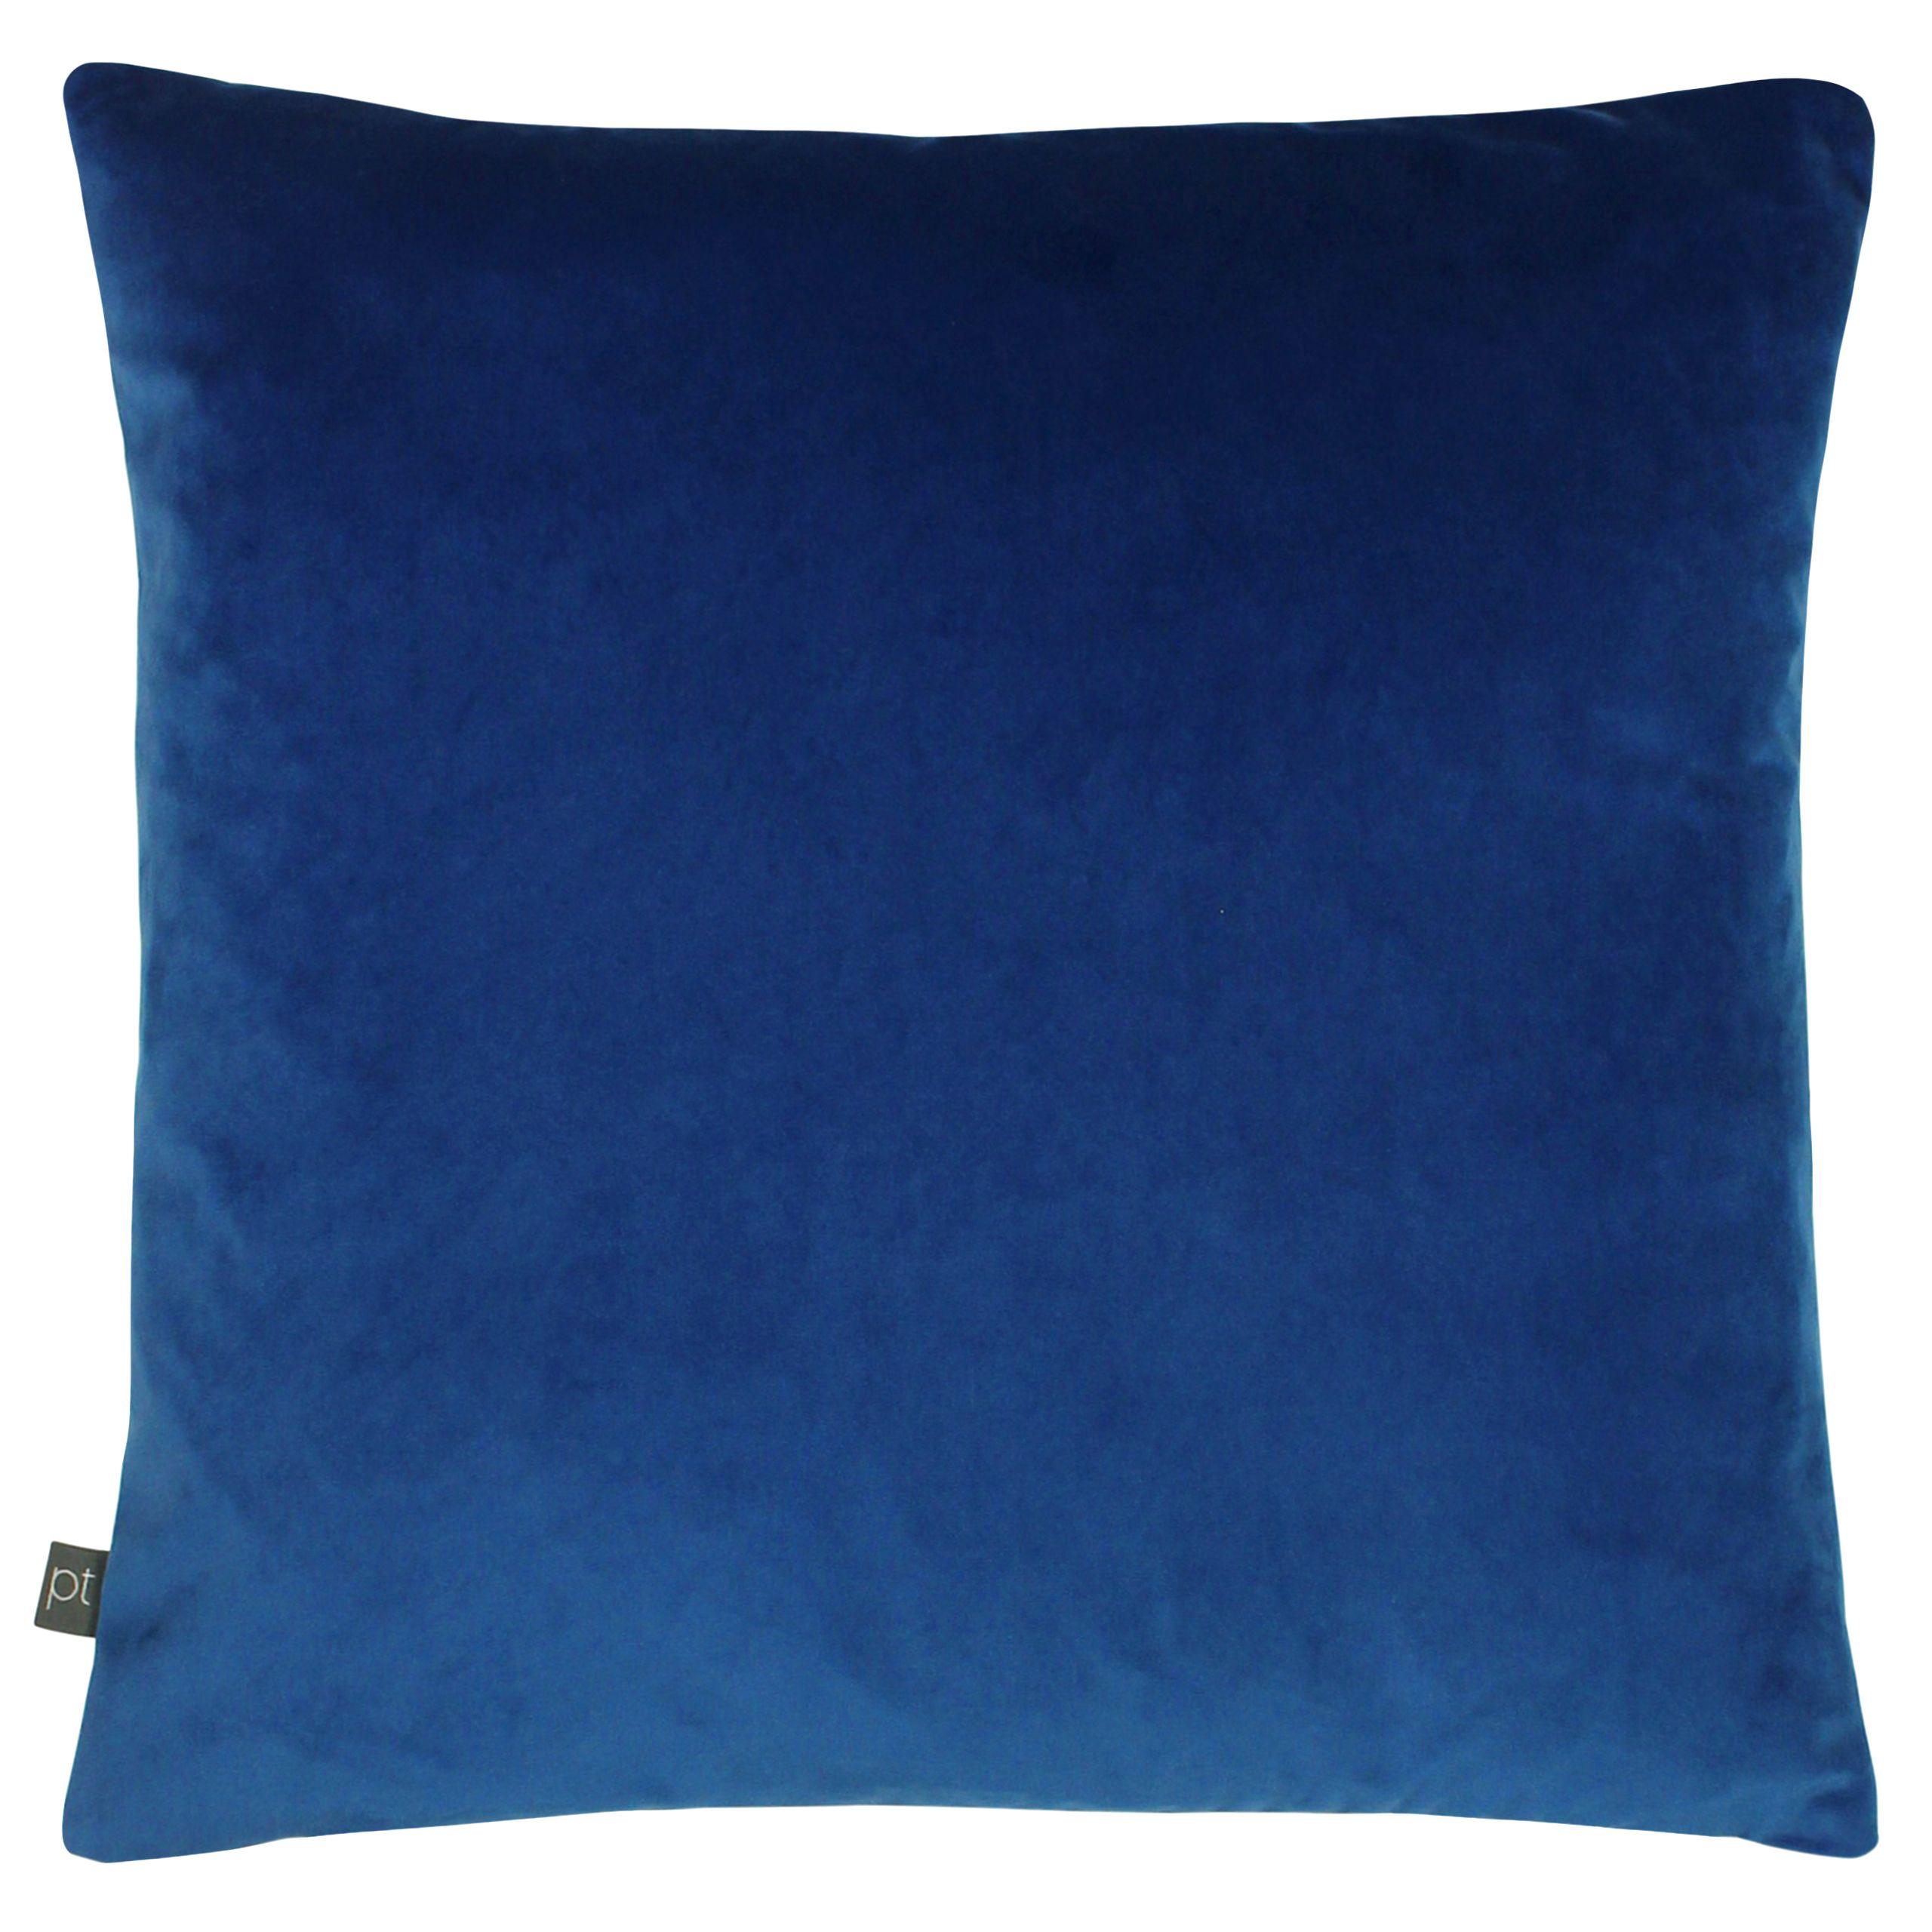 Prestigious Textiles Dolly Mixture Polyester Filled Cushion, Polyester, Cotton, Jungle